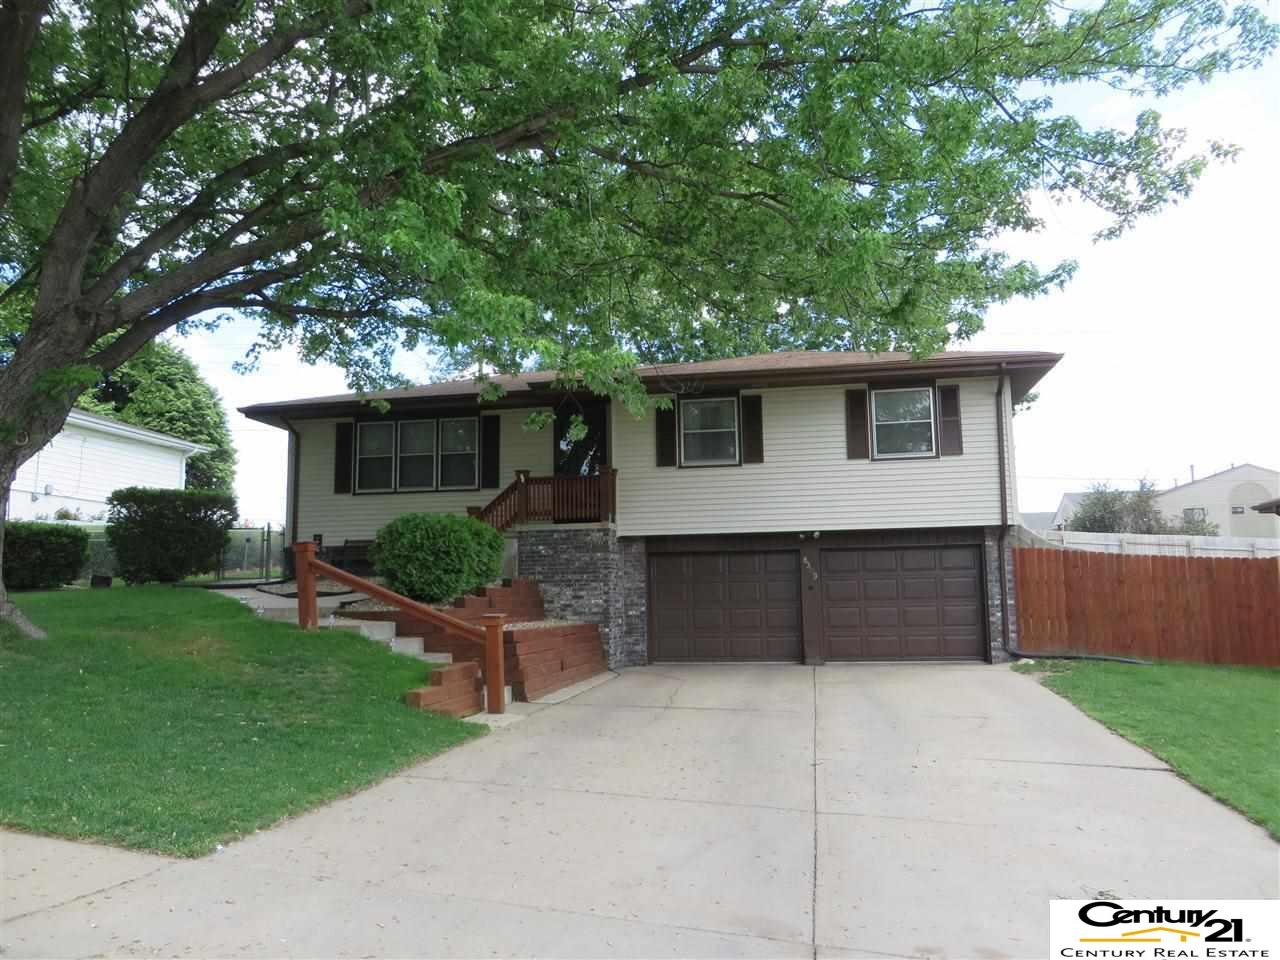 Rental Homes for Rent, ListingId:34157860, location: 8309 S 48th Omaha 68157